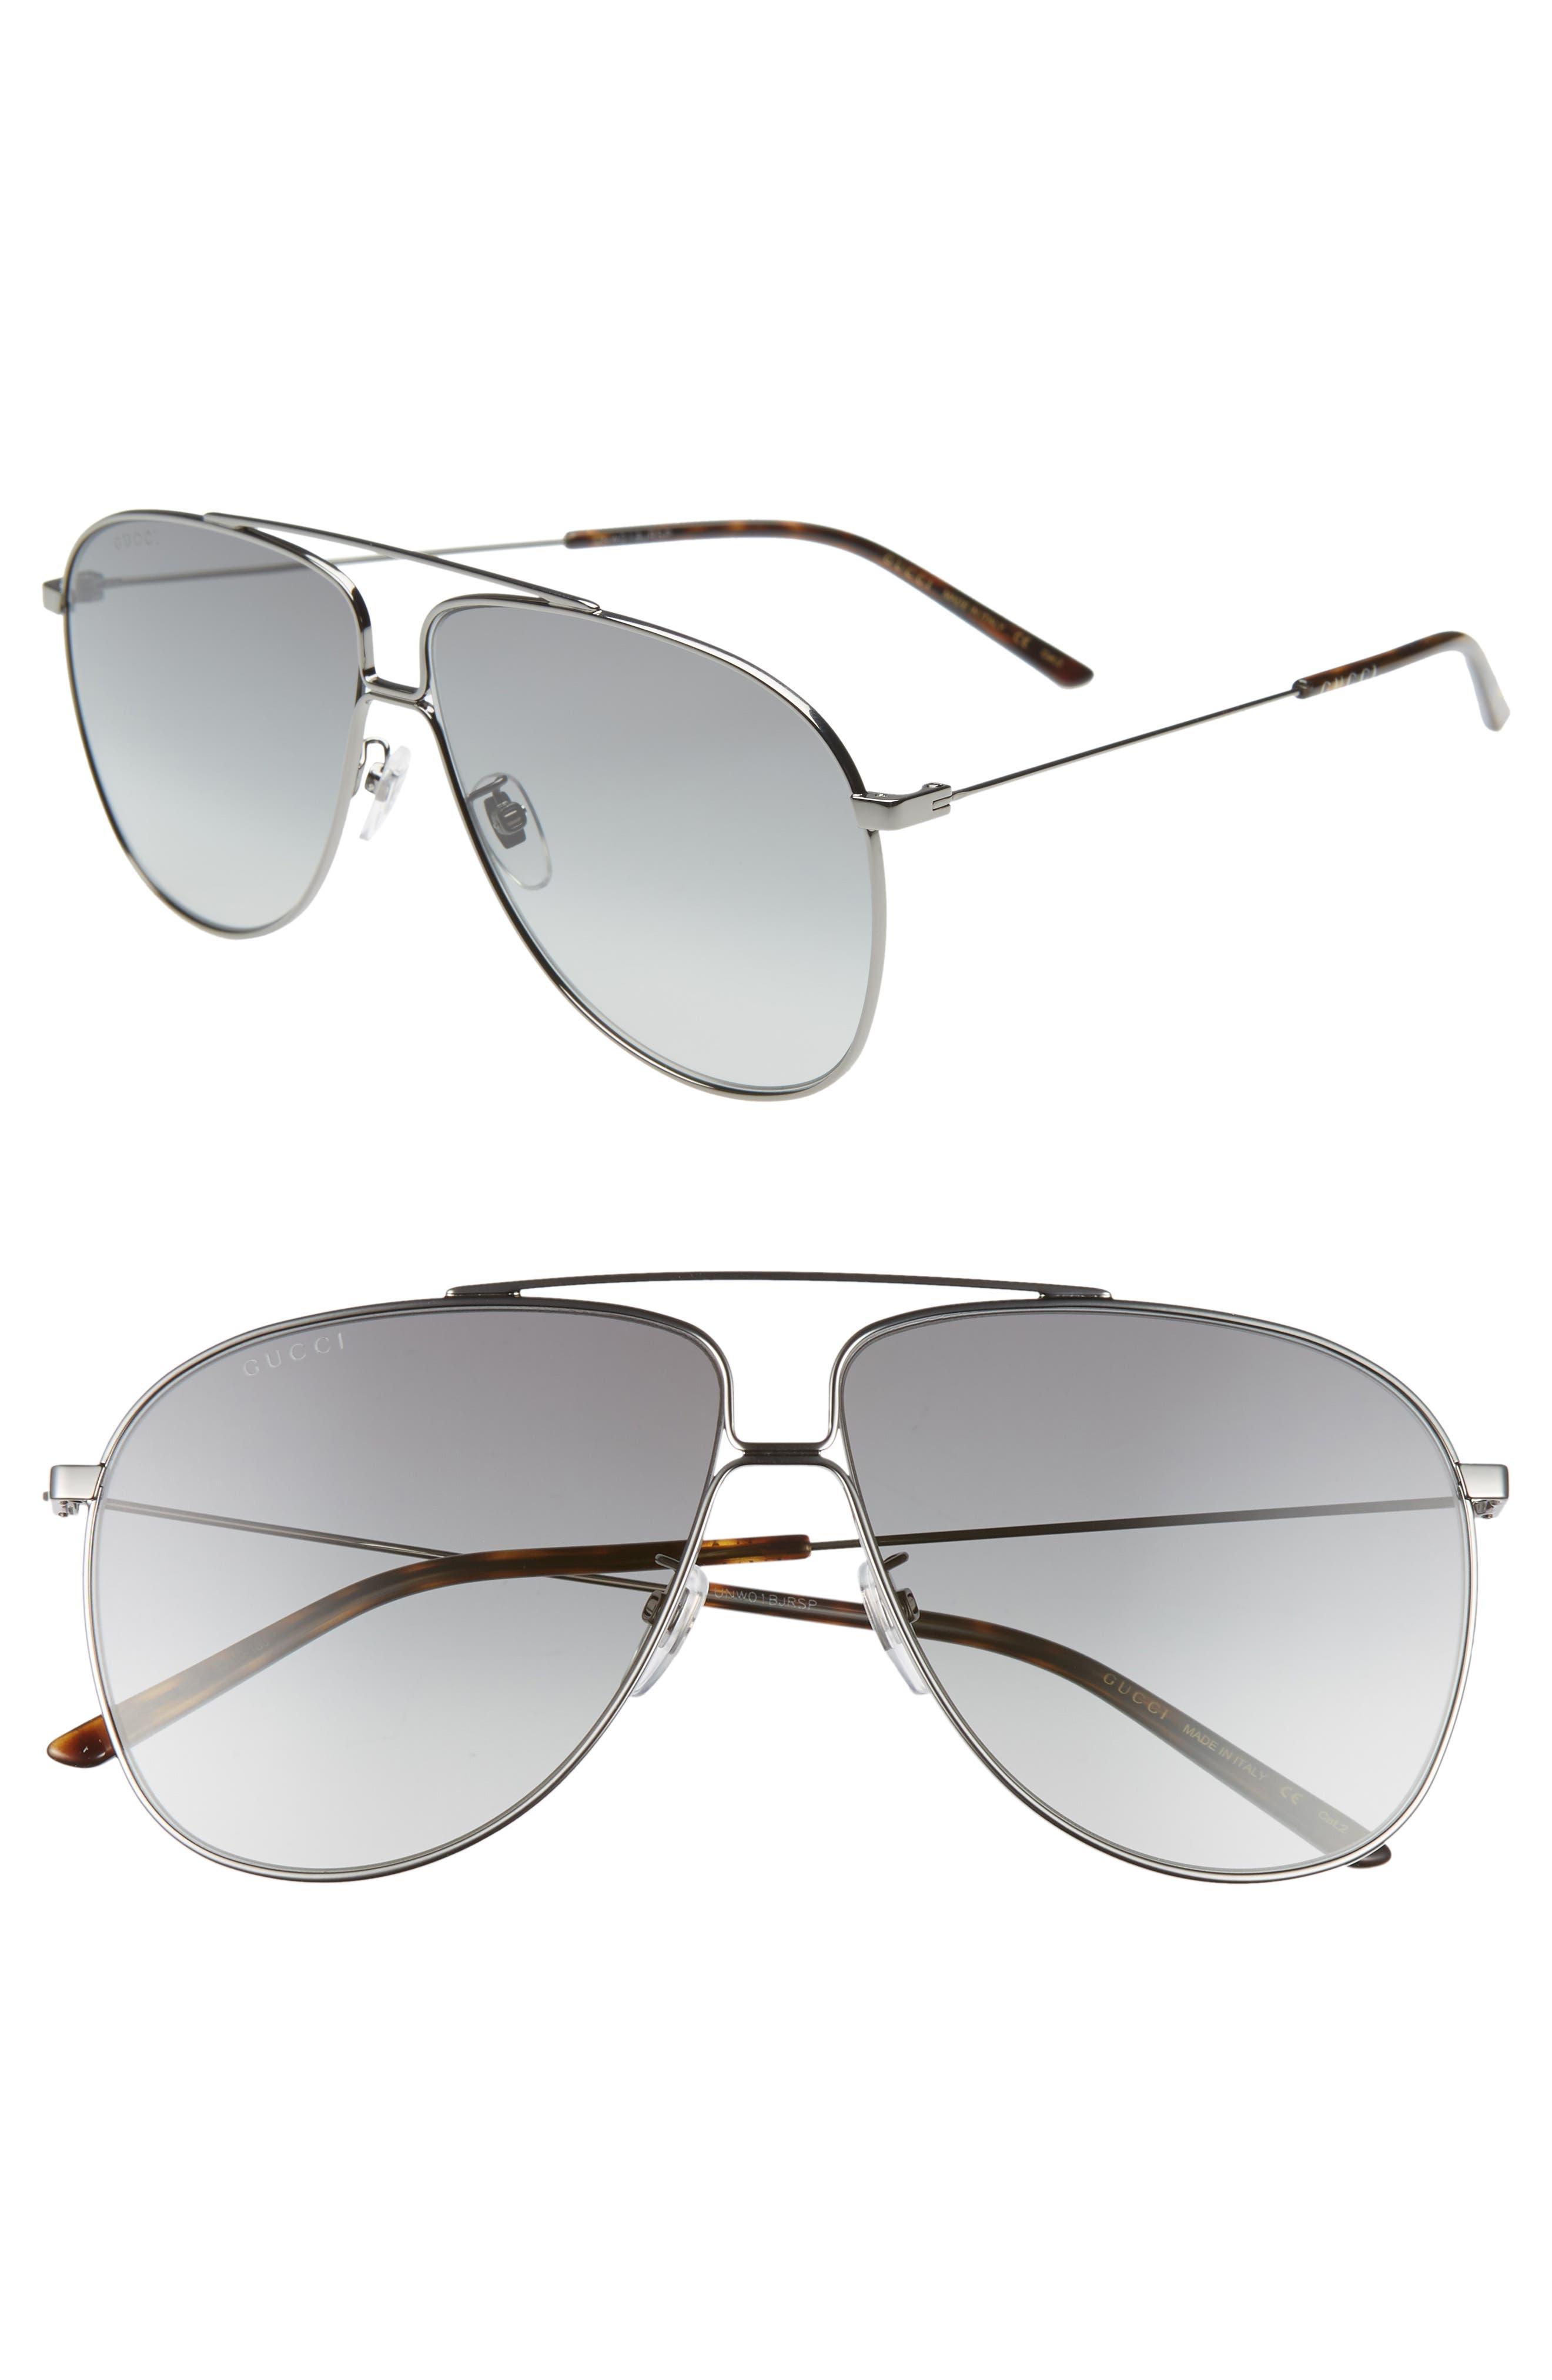 63mm Oversize Aviator Sunglasses, Main, color, SHNY DK RUTH/ GREY GRAD